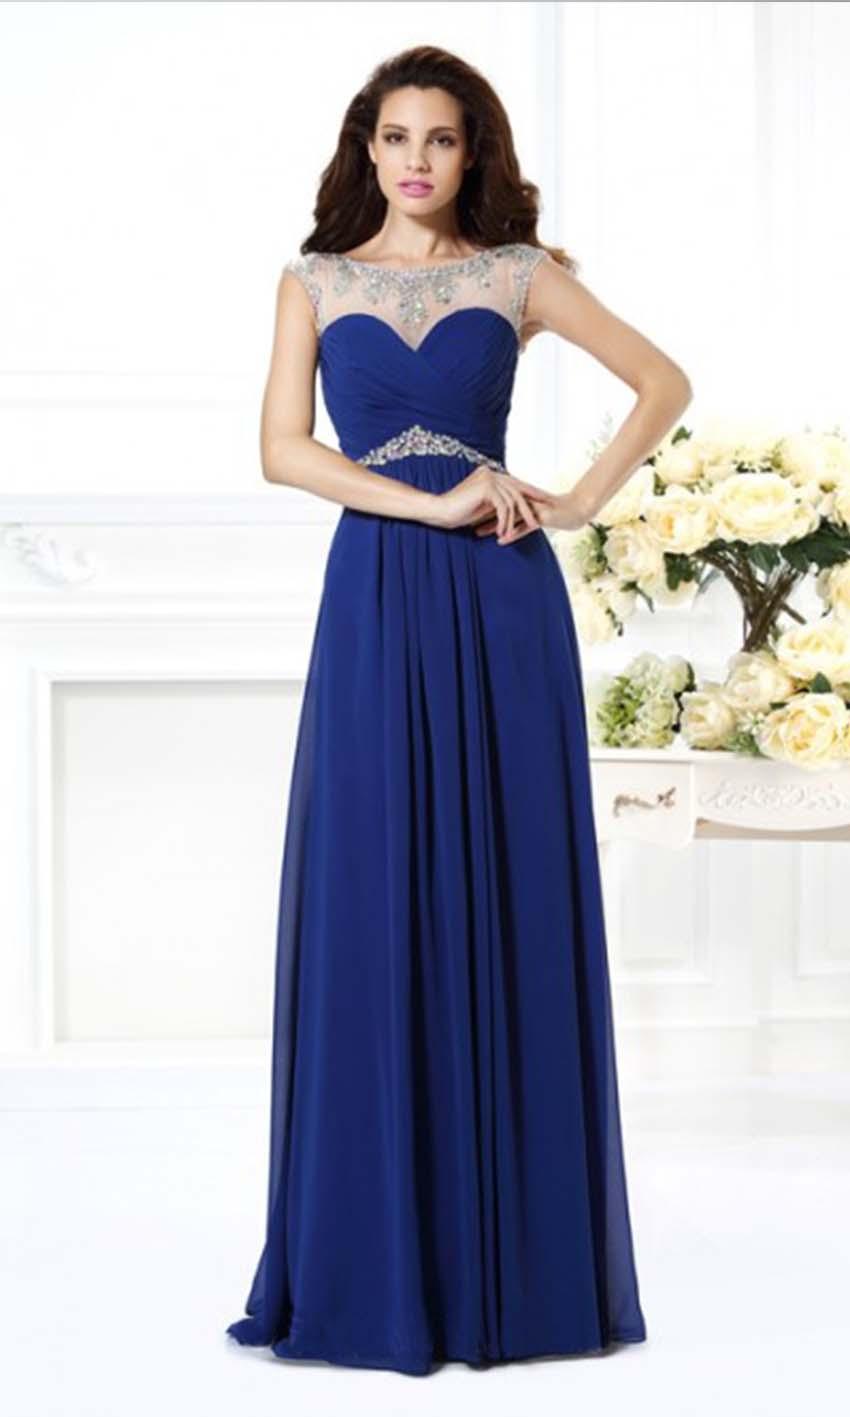 4272a8f9469 Blue Formal Dresses Uk - Data Dynamic AG